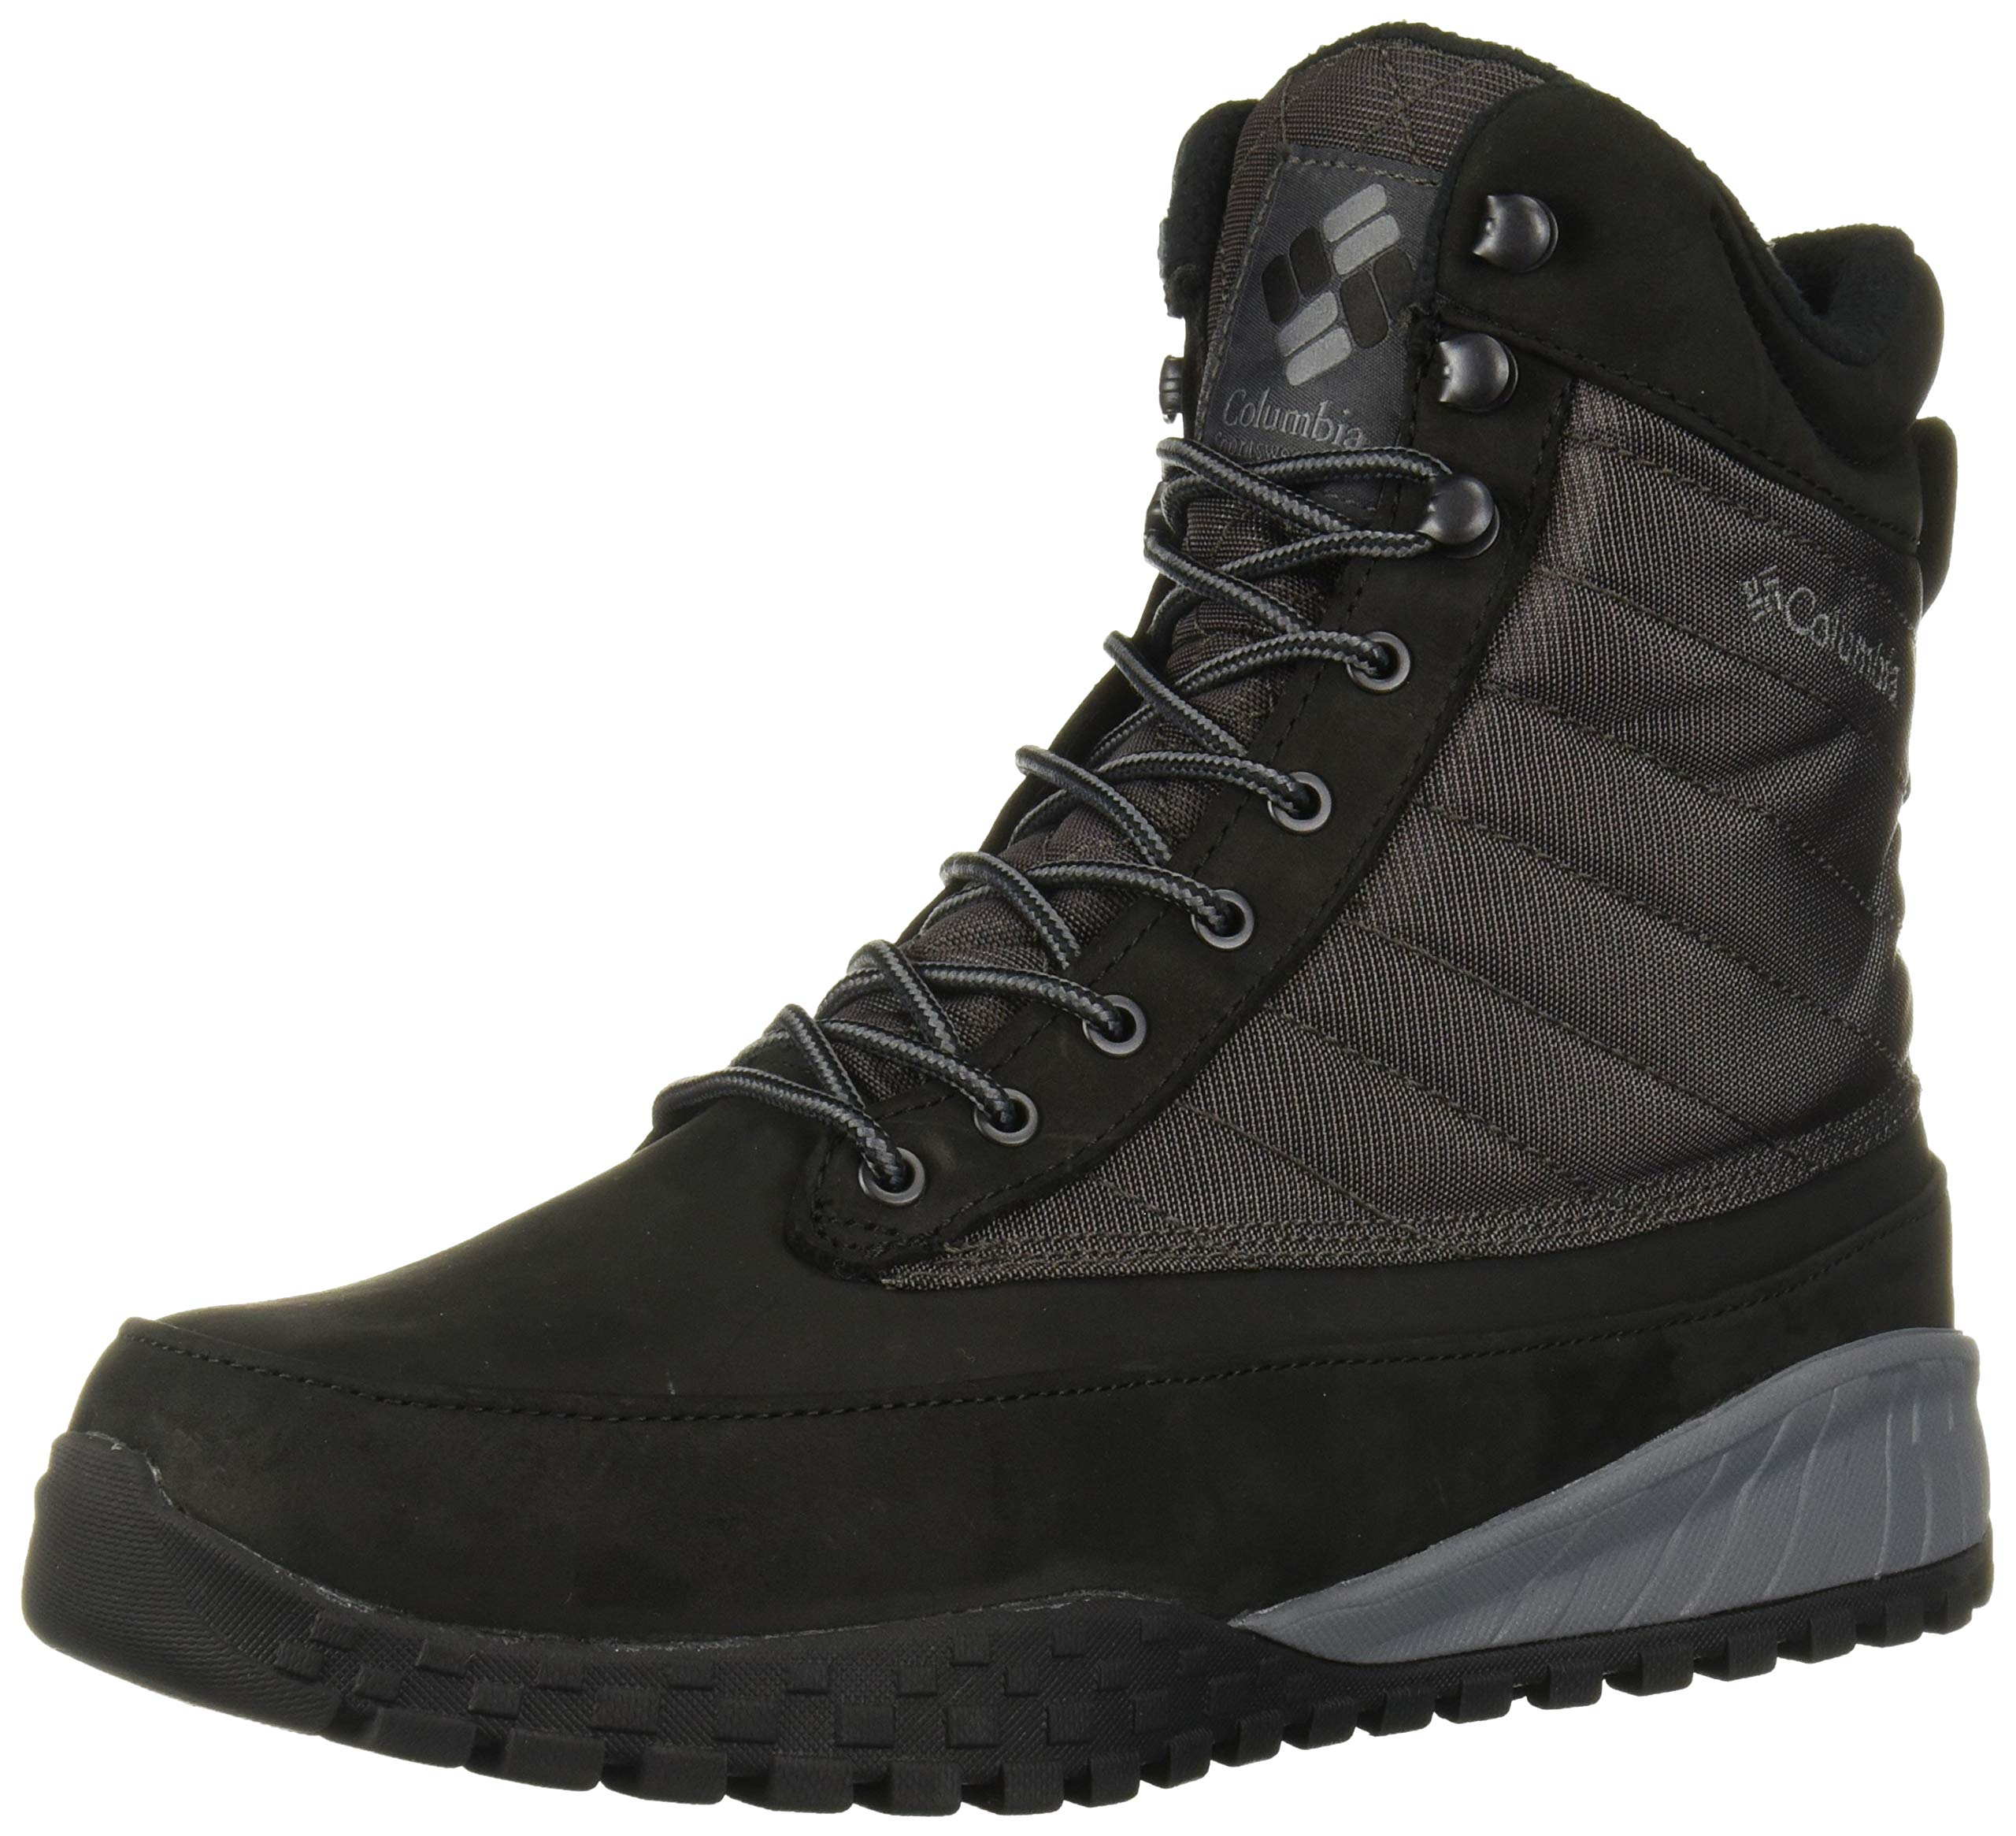 Columbia Men's Fairbanks 1006 Snow Boot, Black, ti Grey Steel, 12 Regular US by Columbia